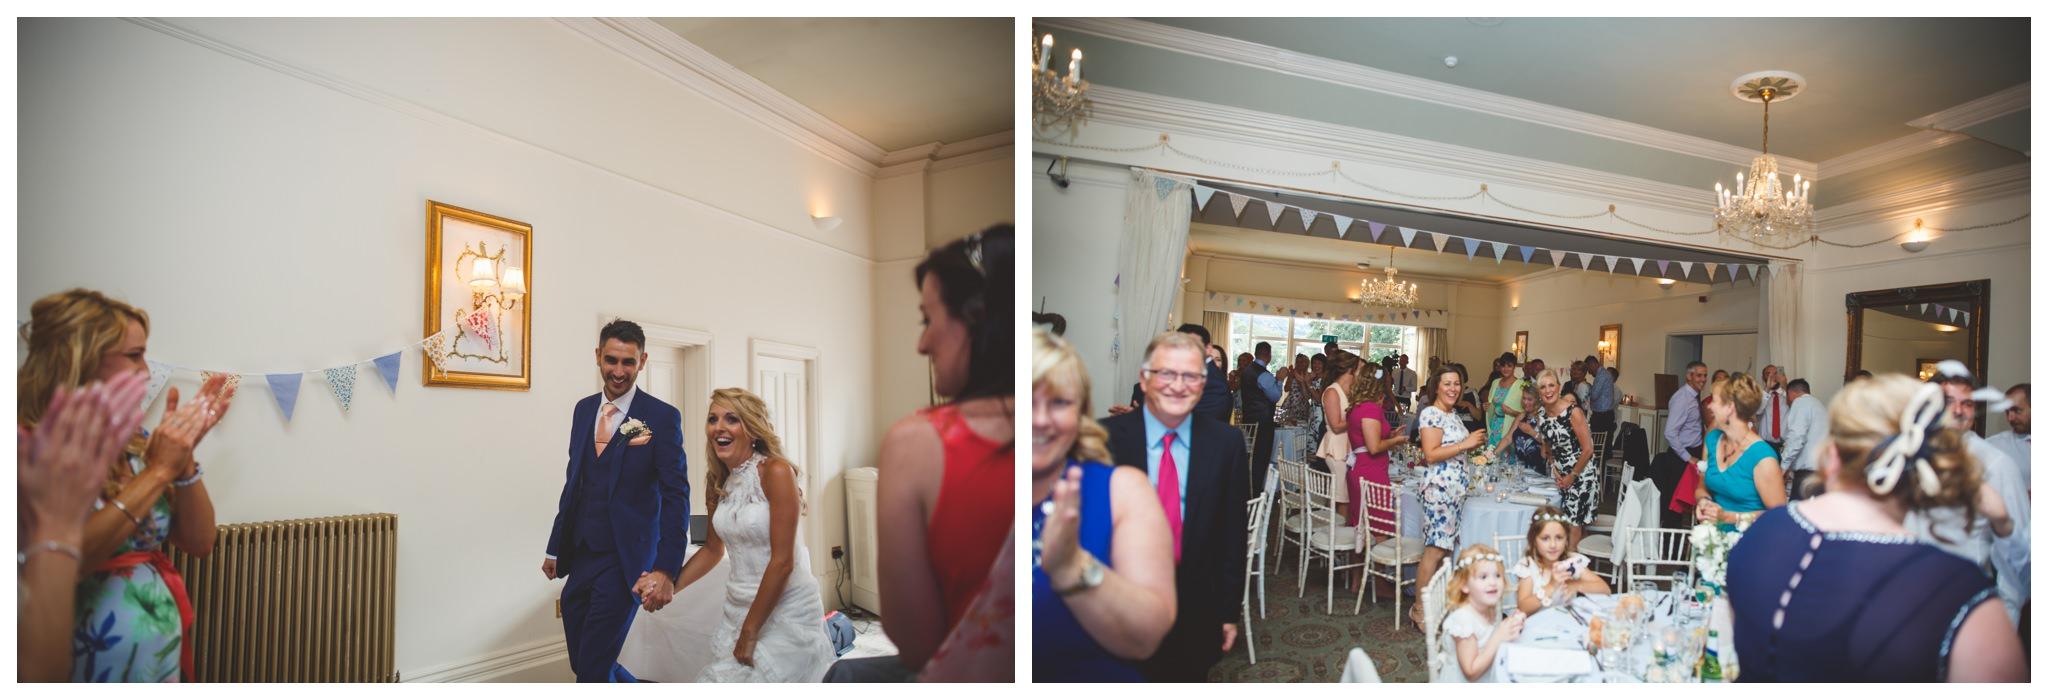 Richard Savage Photography - Wedding - Peterstone Court Brecon - 2016-05-11_0045